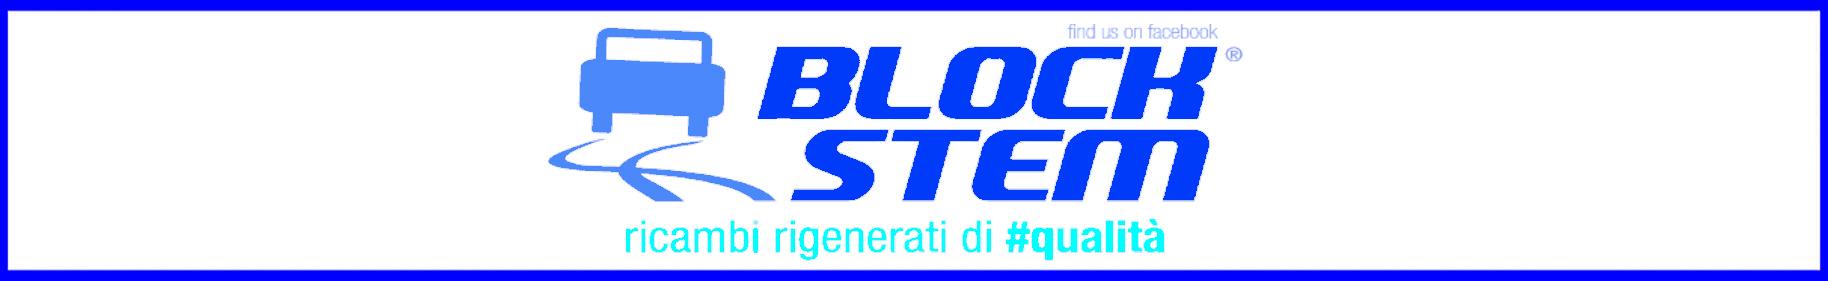 BLOCK STEM – banner sotto video